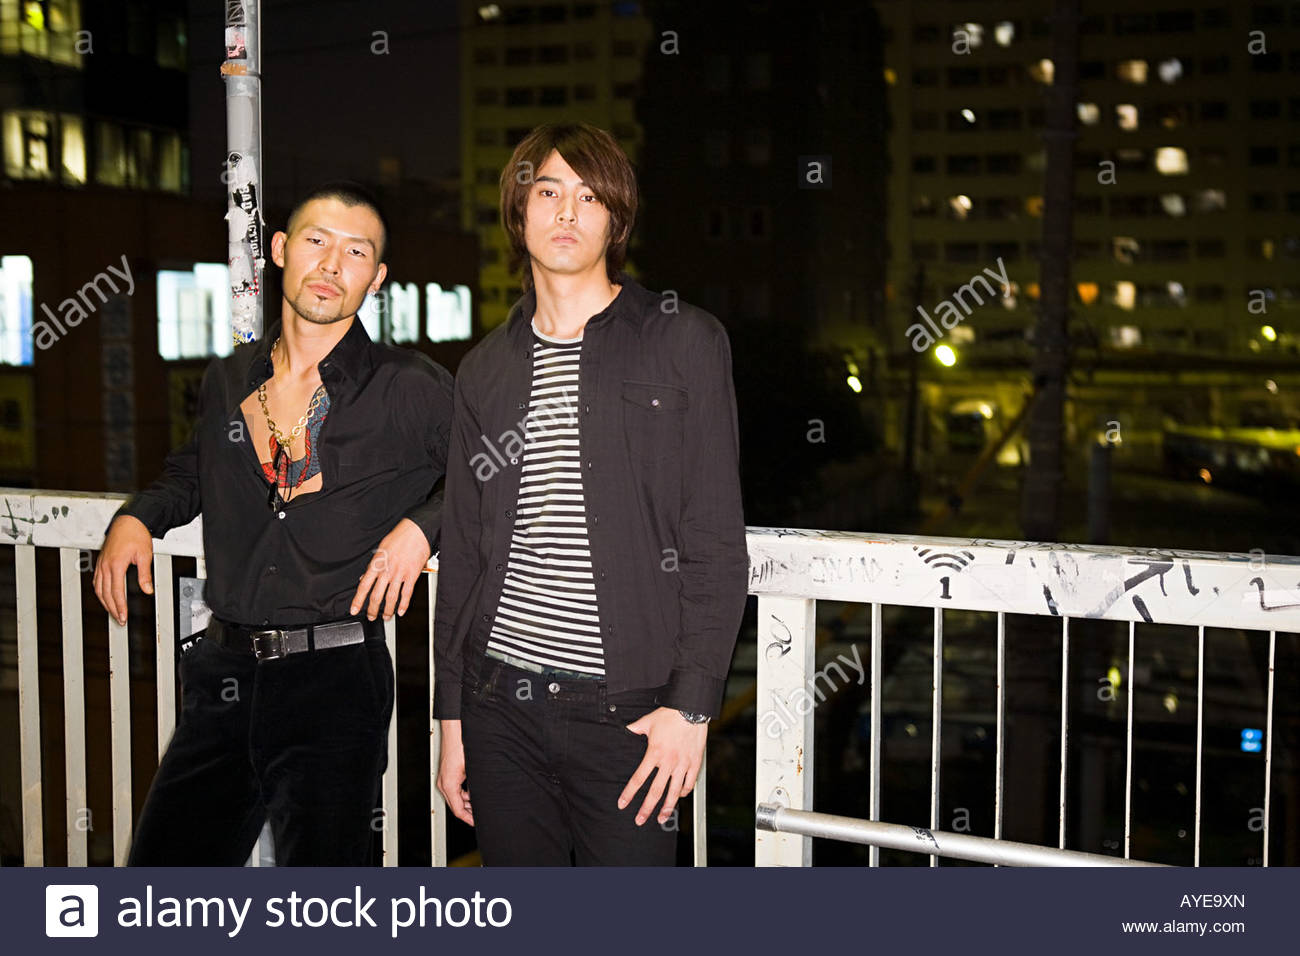 Two japanese men against urban backdrop - Stock Image